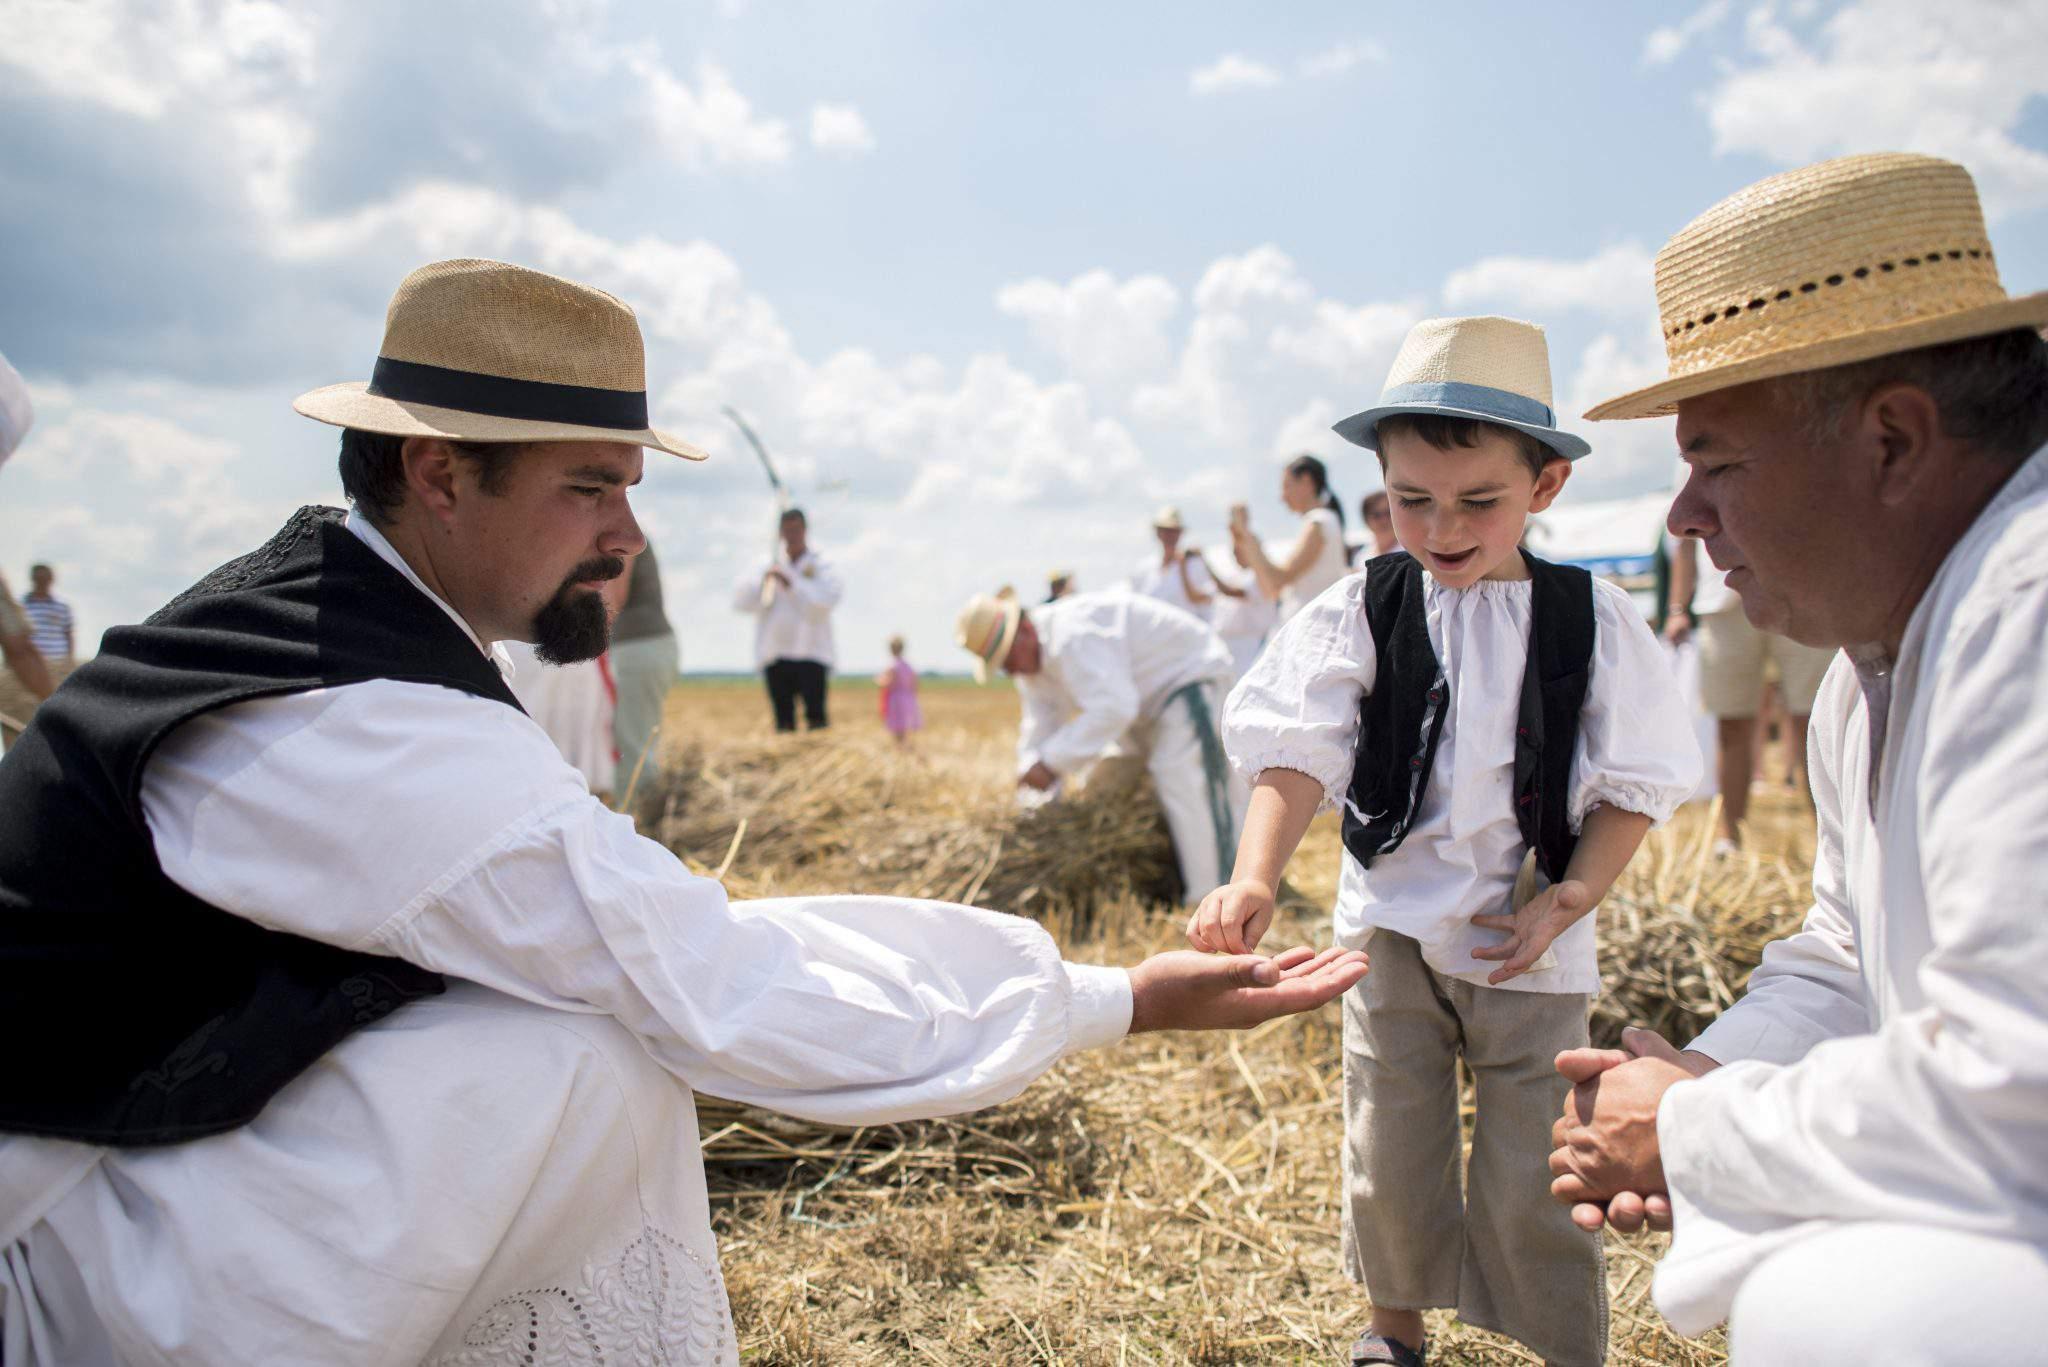 harvest hungary europe